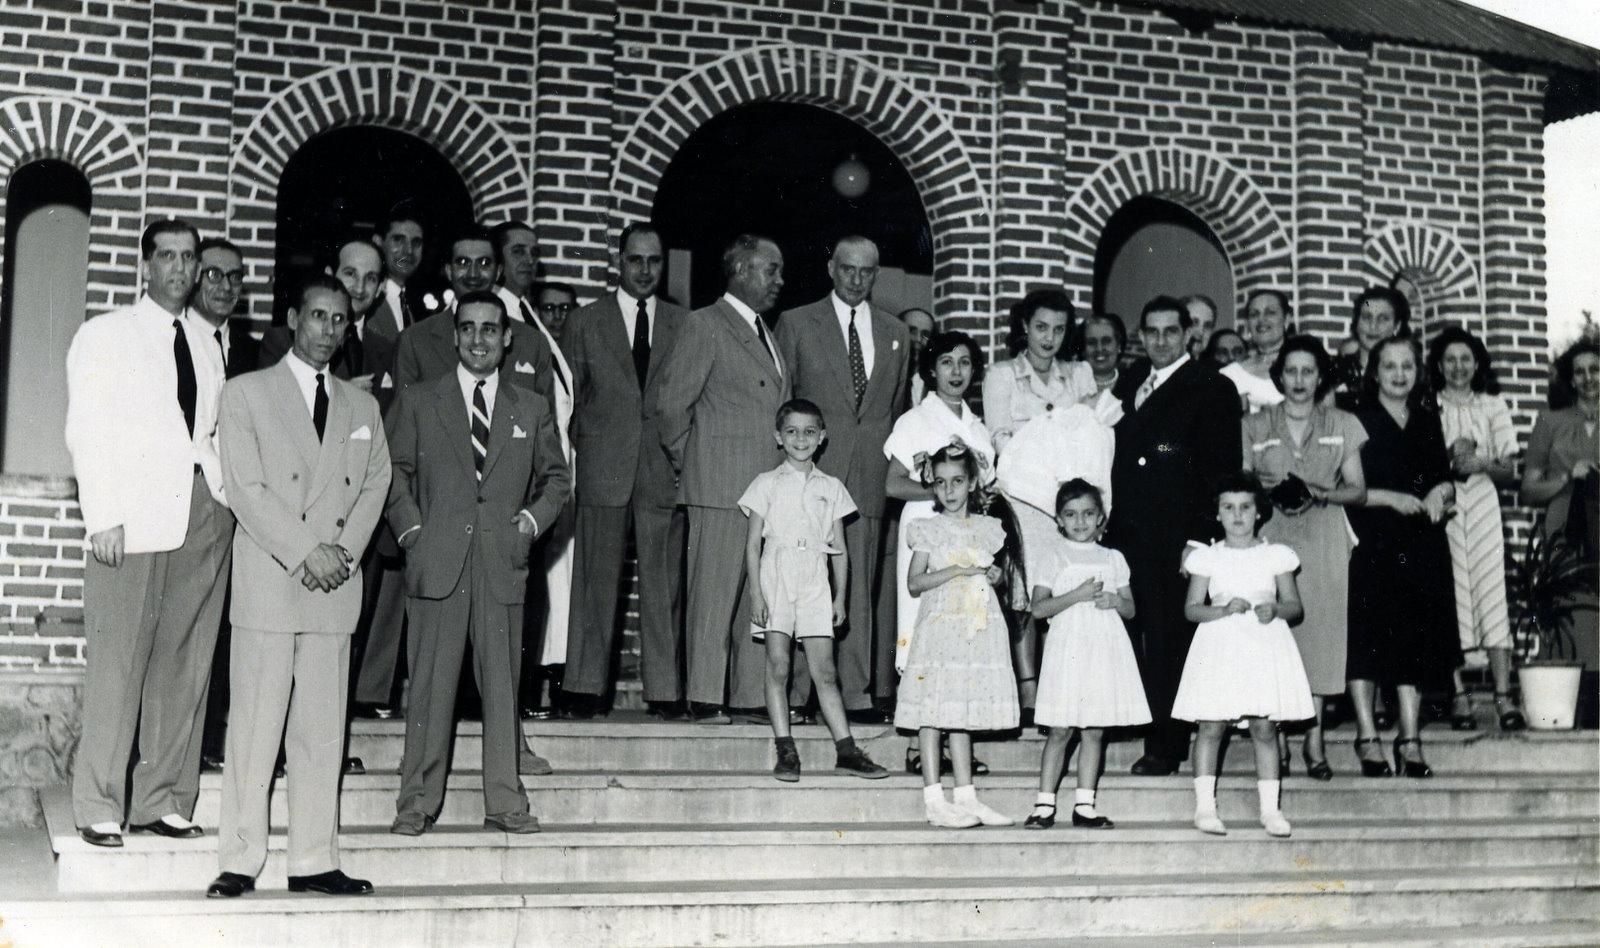 Casal Santos David, Joao Alho, ....  ( Baptizado do Mario Santos David?)